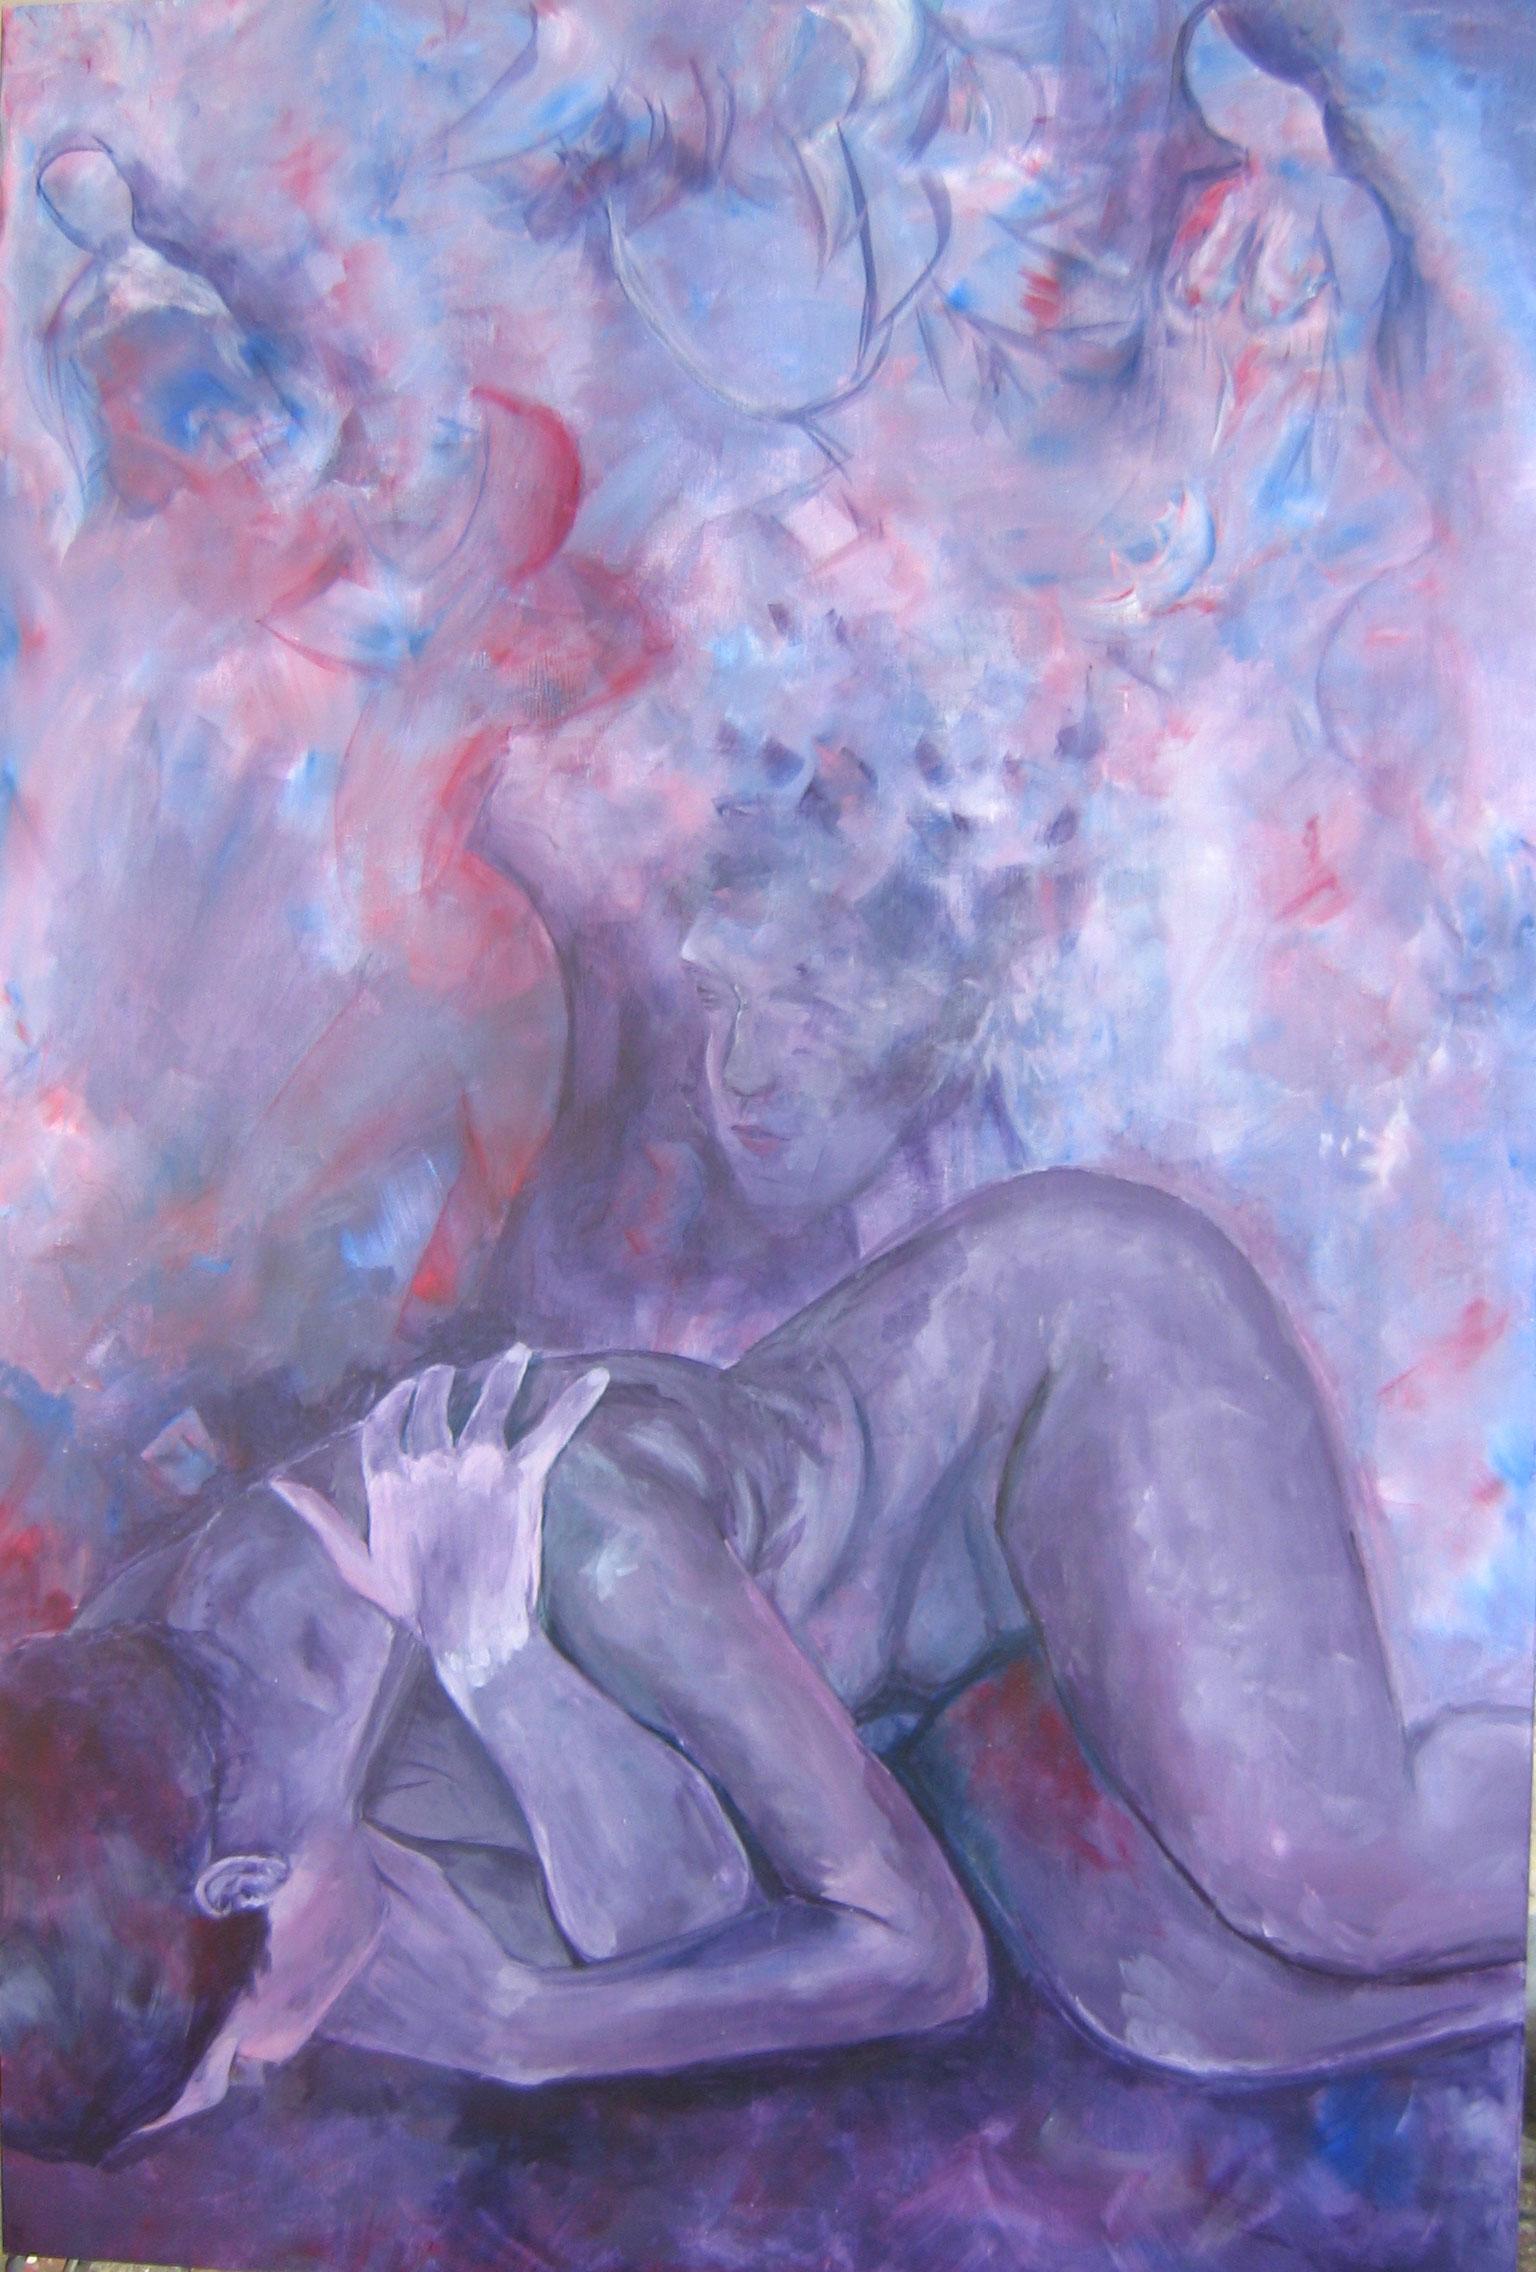 Tajanstvenim stazama duse... - Page 5 Lost-in-dreams